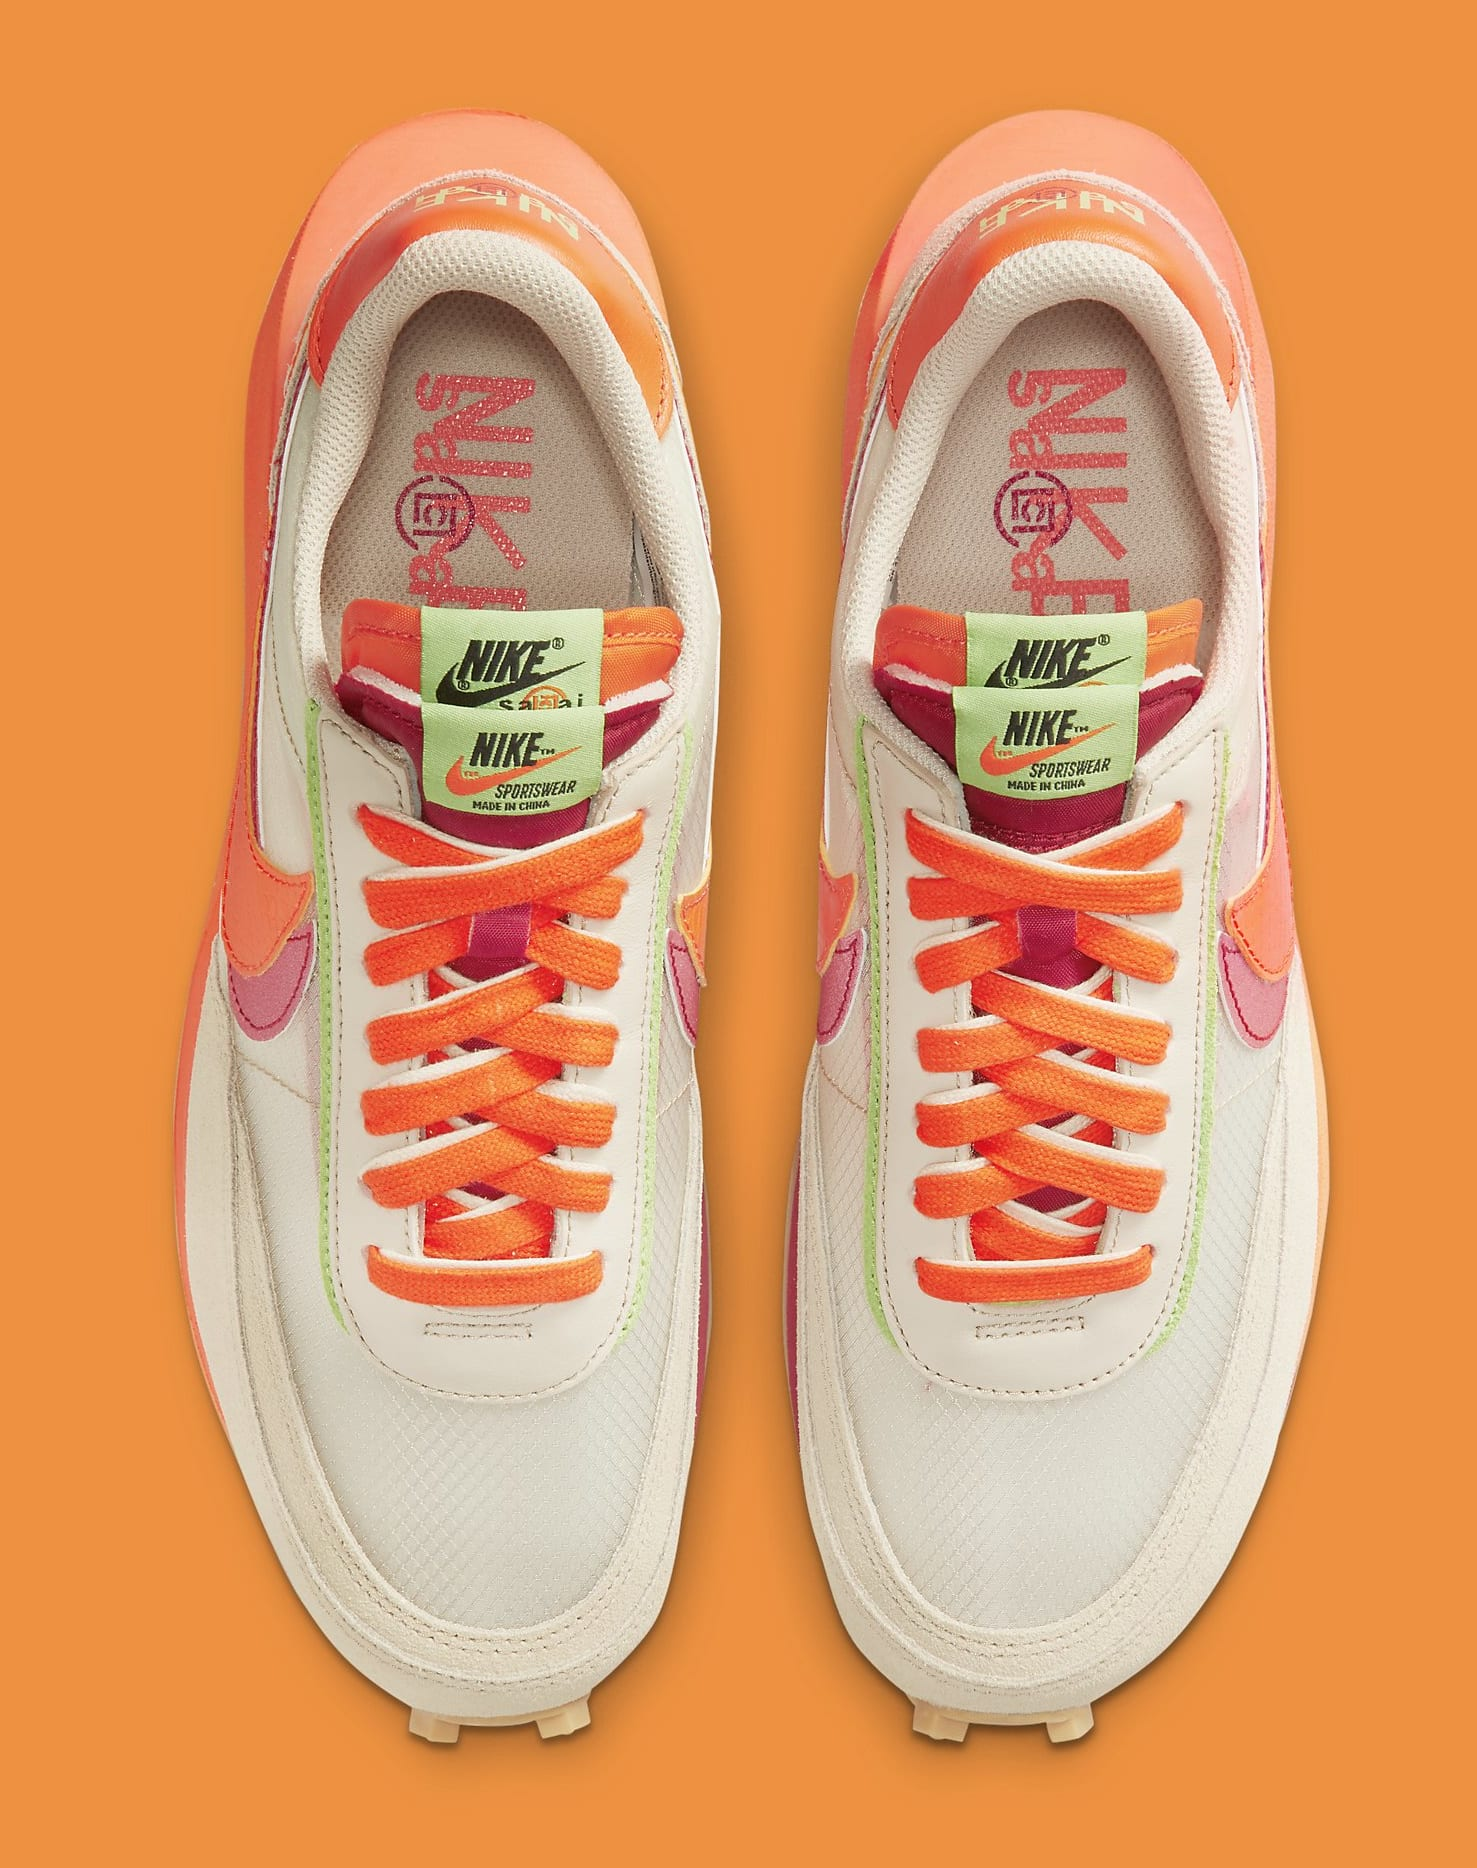 Sacai x Clot x Nike LDWaffle DH1347-100 Top